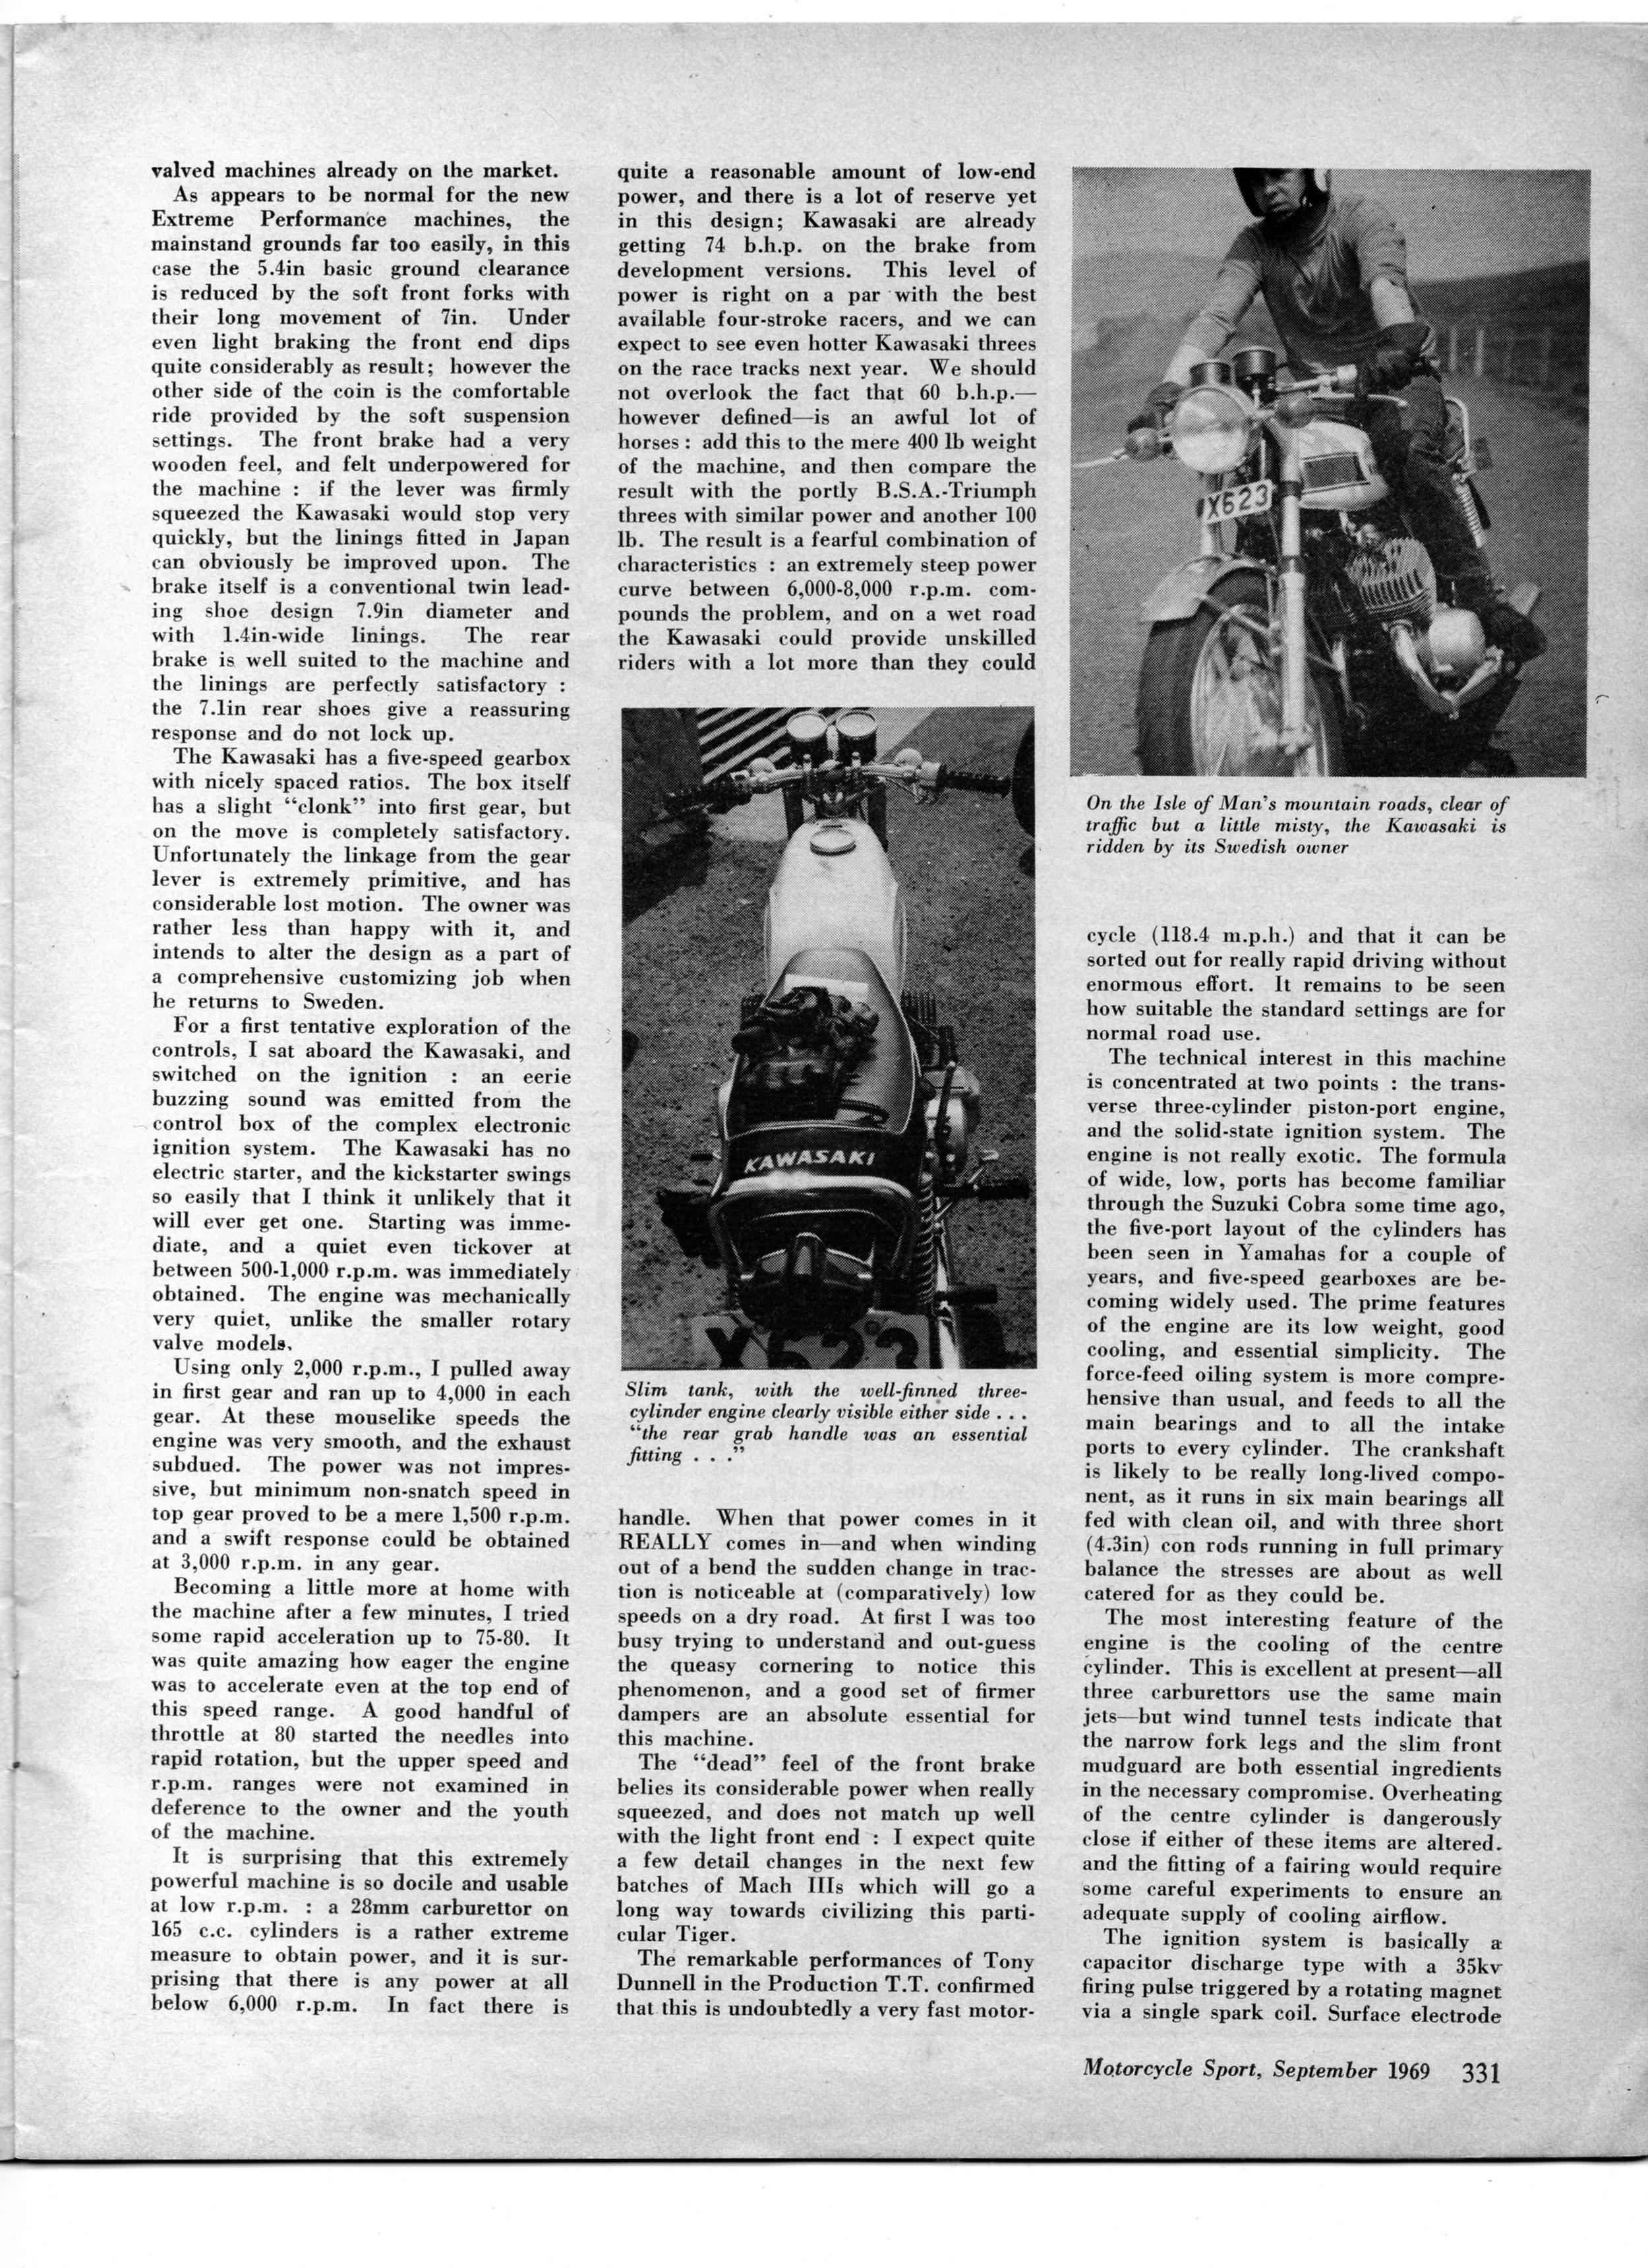 1969 Kawasaki 500-3 road test 2.jpg